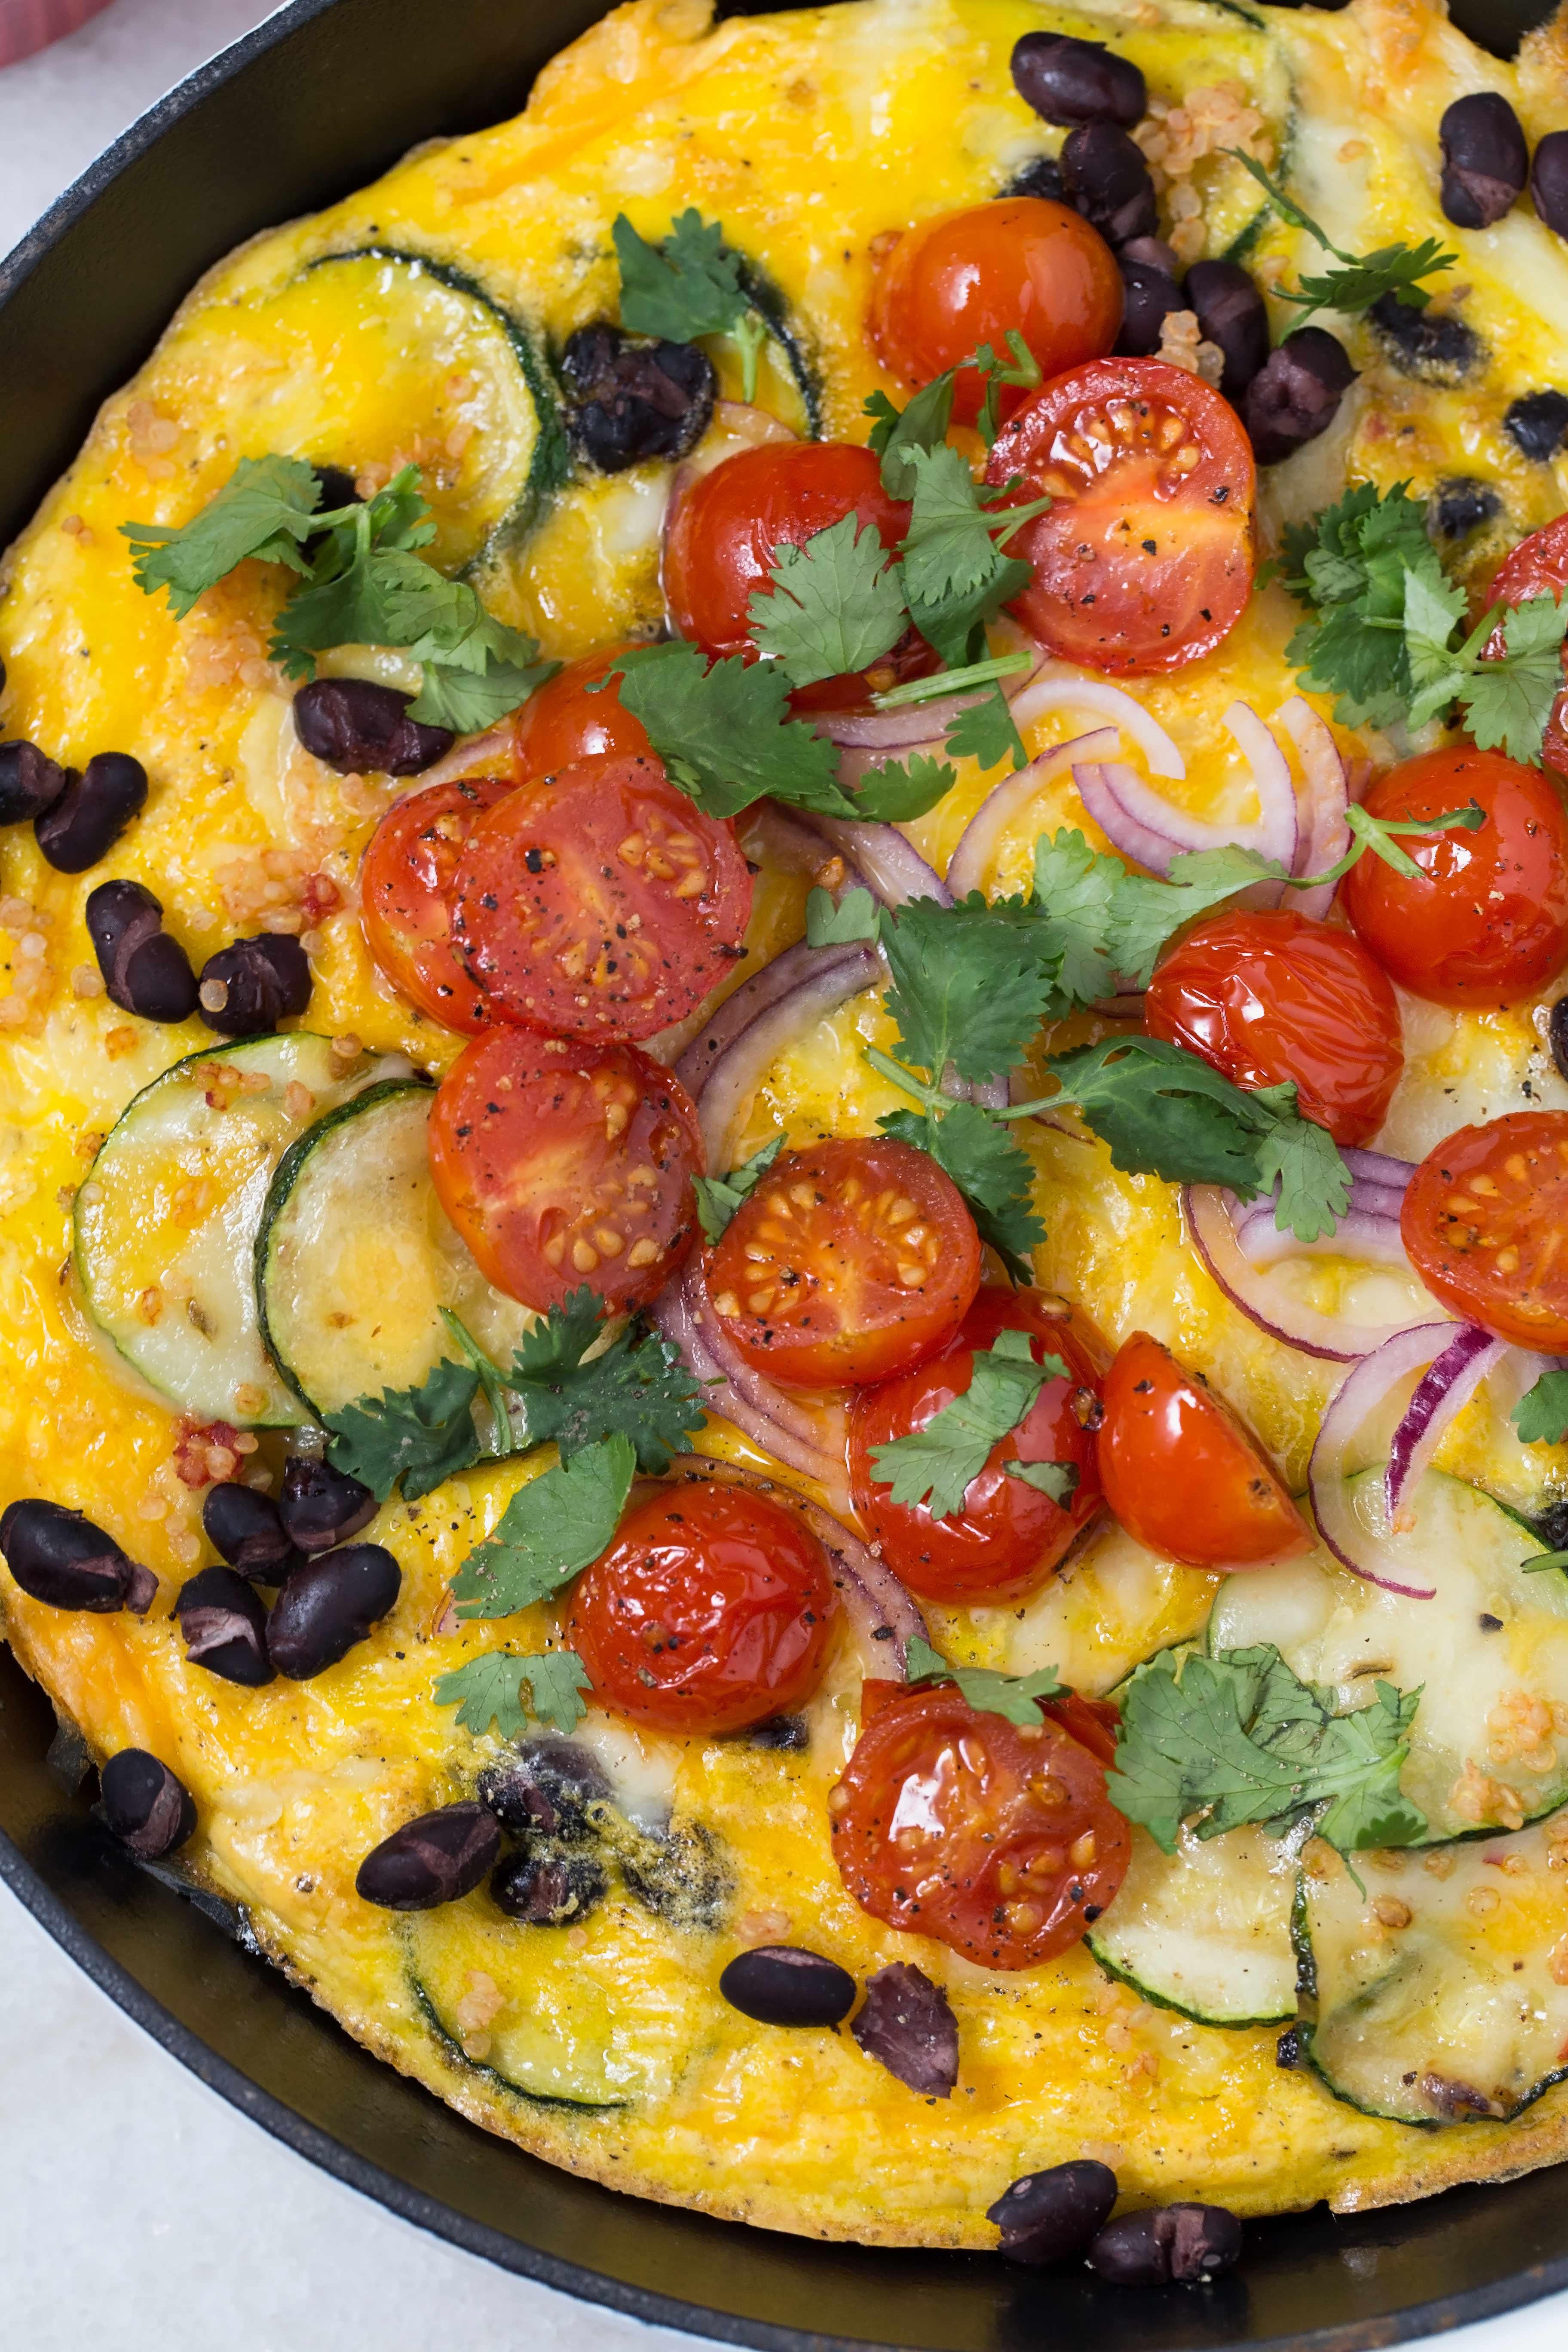 pan with Spanish Frittata